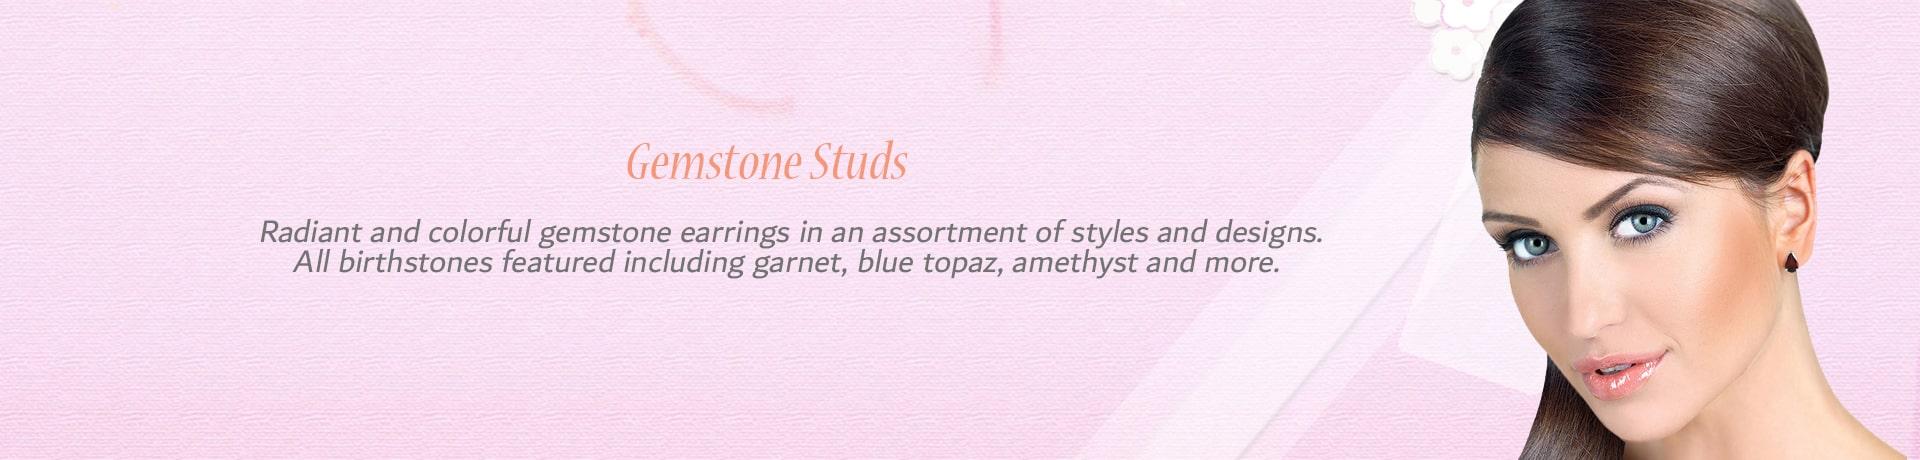 Category Gemstone Stud